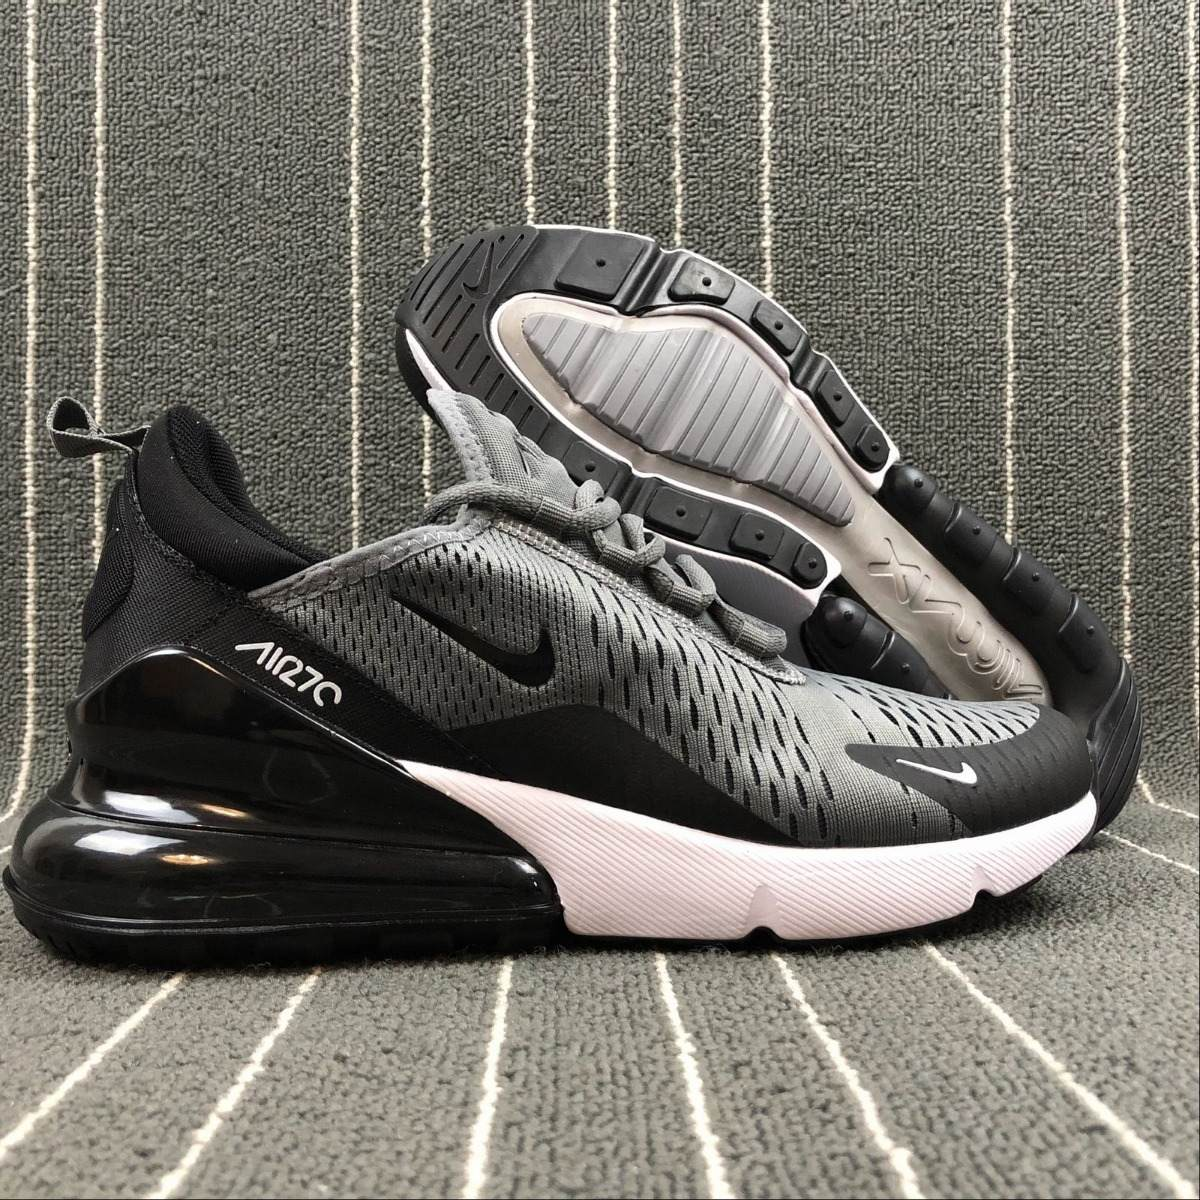 f43f8008f286b zapatillas nike air max 270 m.grey-back 40-45 exclusive line. Cargando zoom.